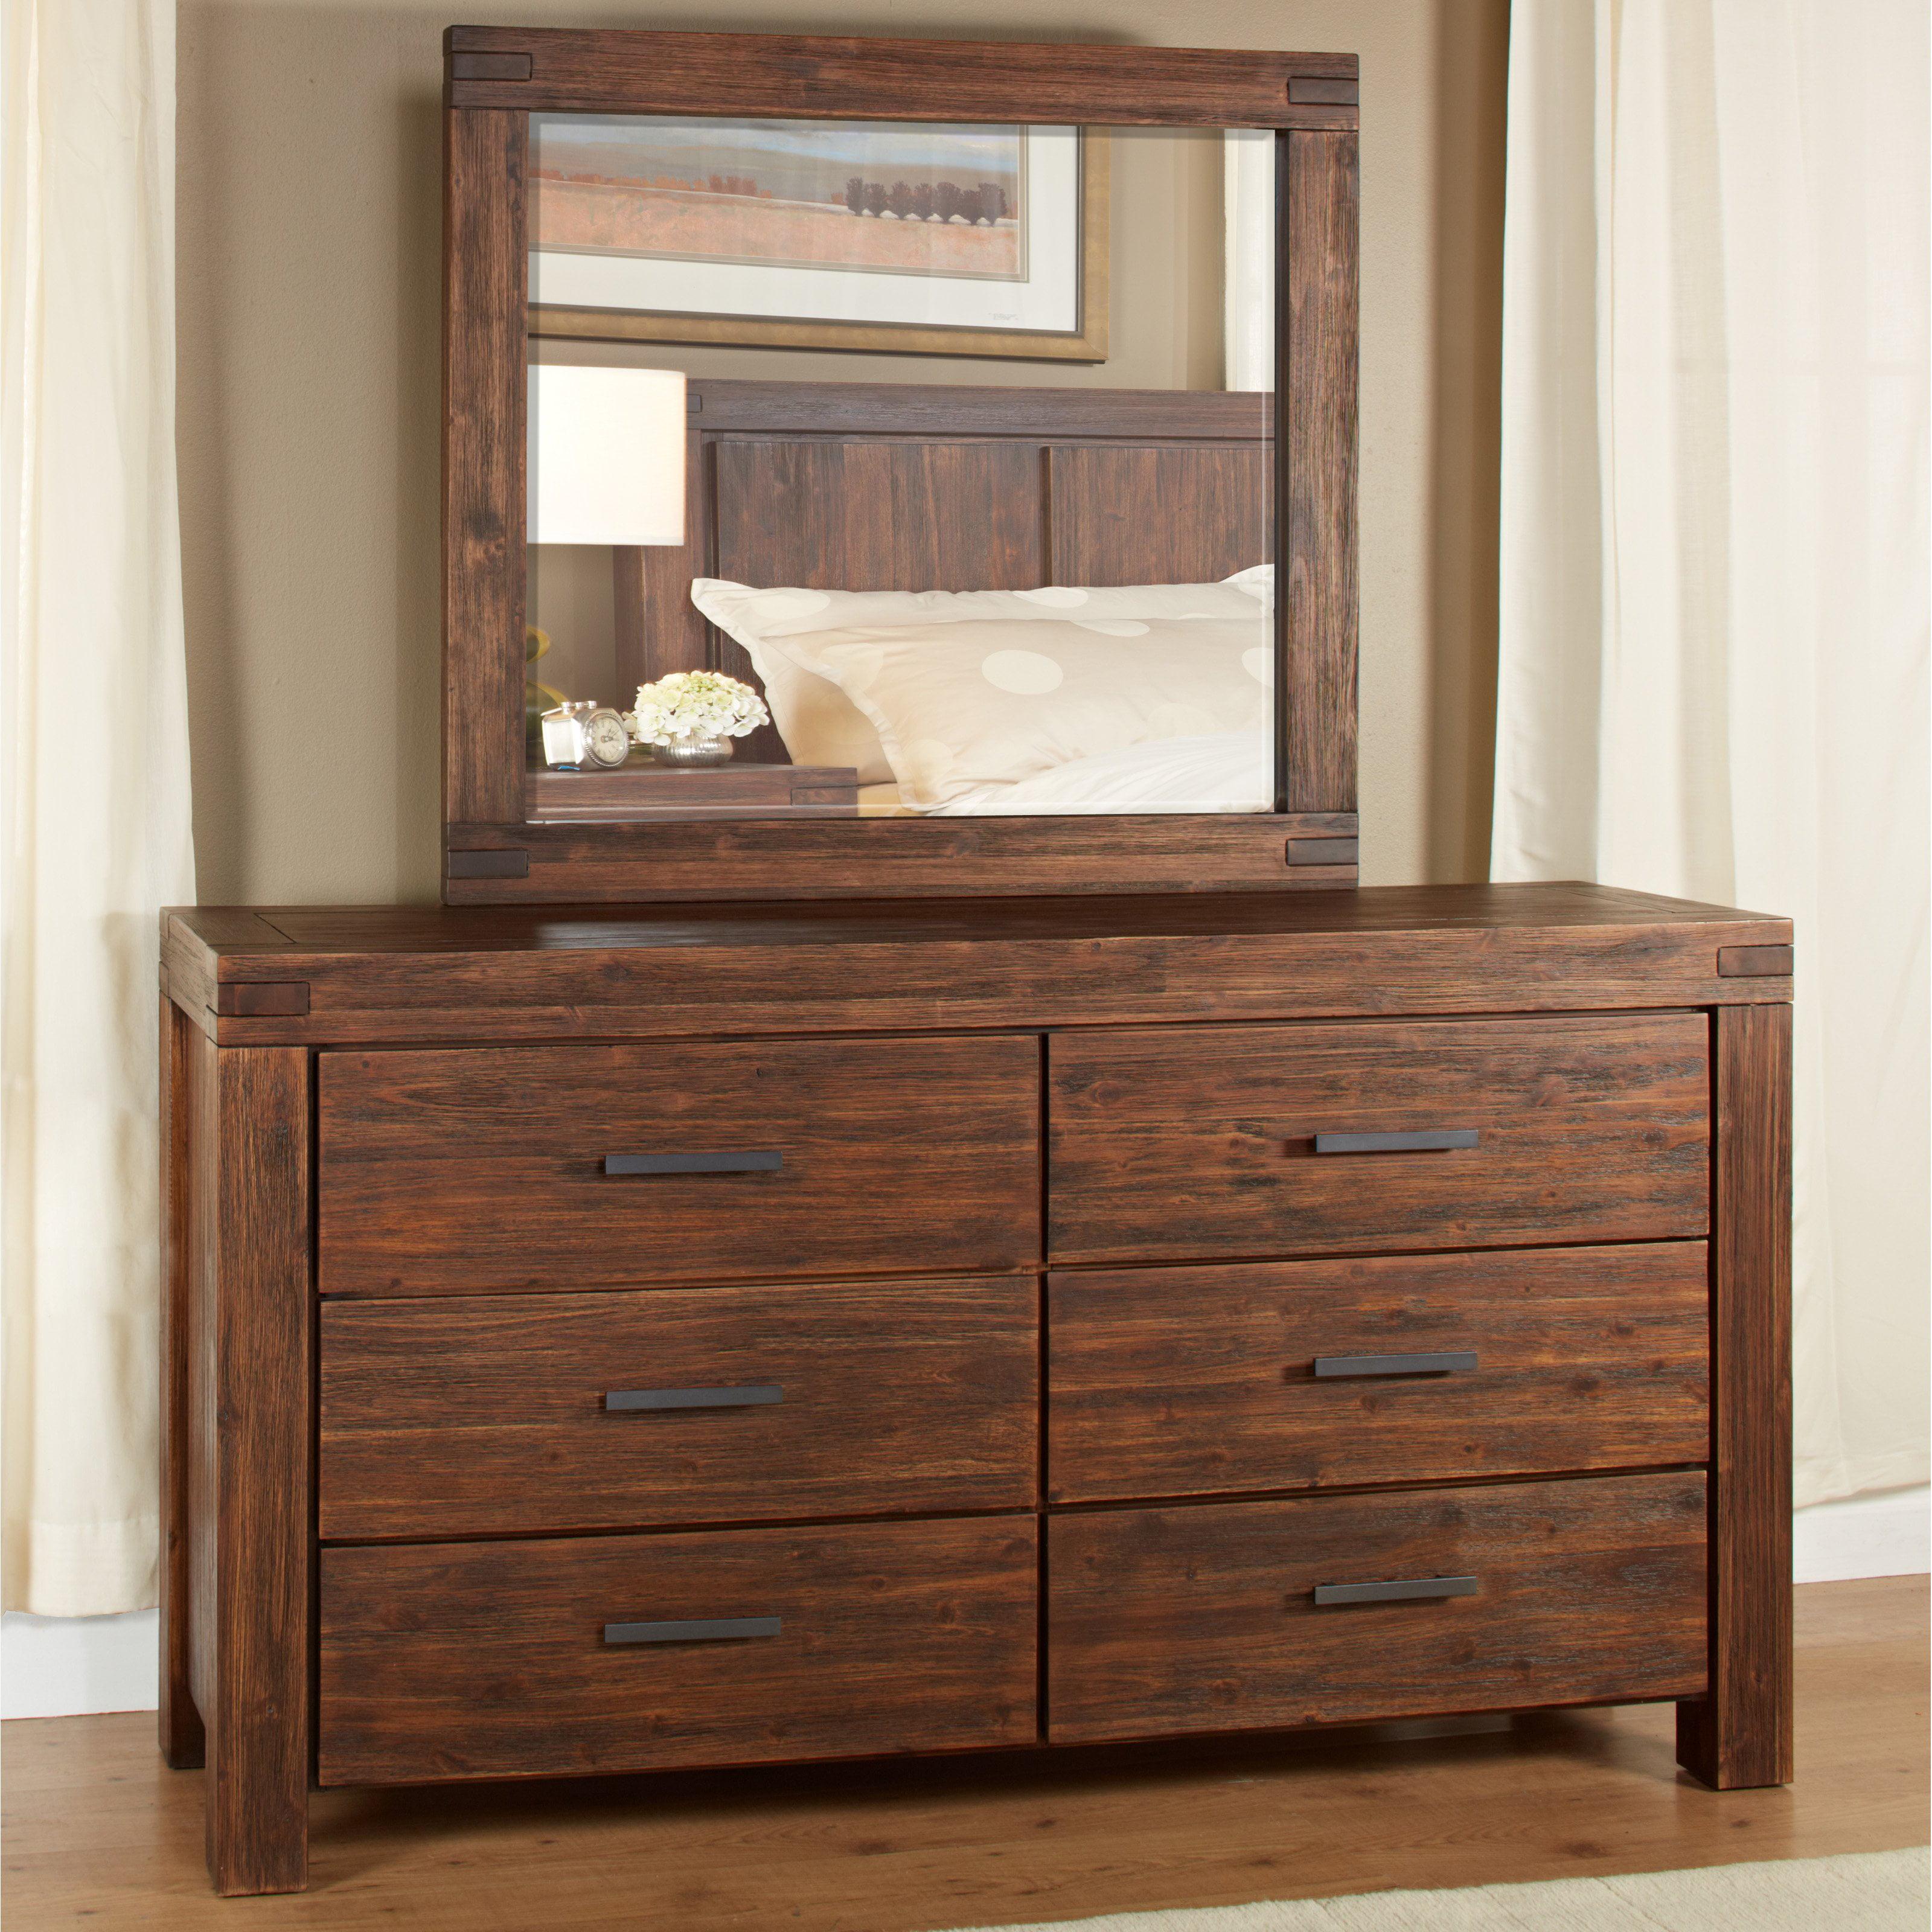 Modus Meadow 6 Drawer Dresser Brick Brown by Modus Furniture International